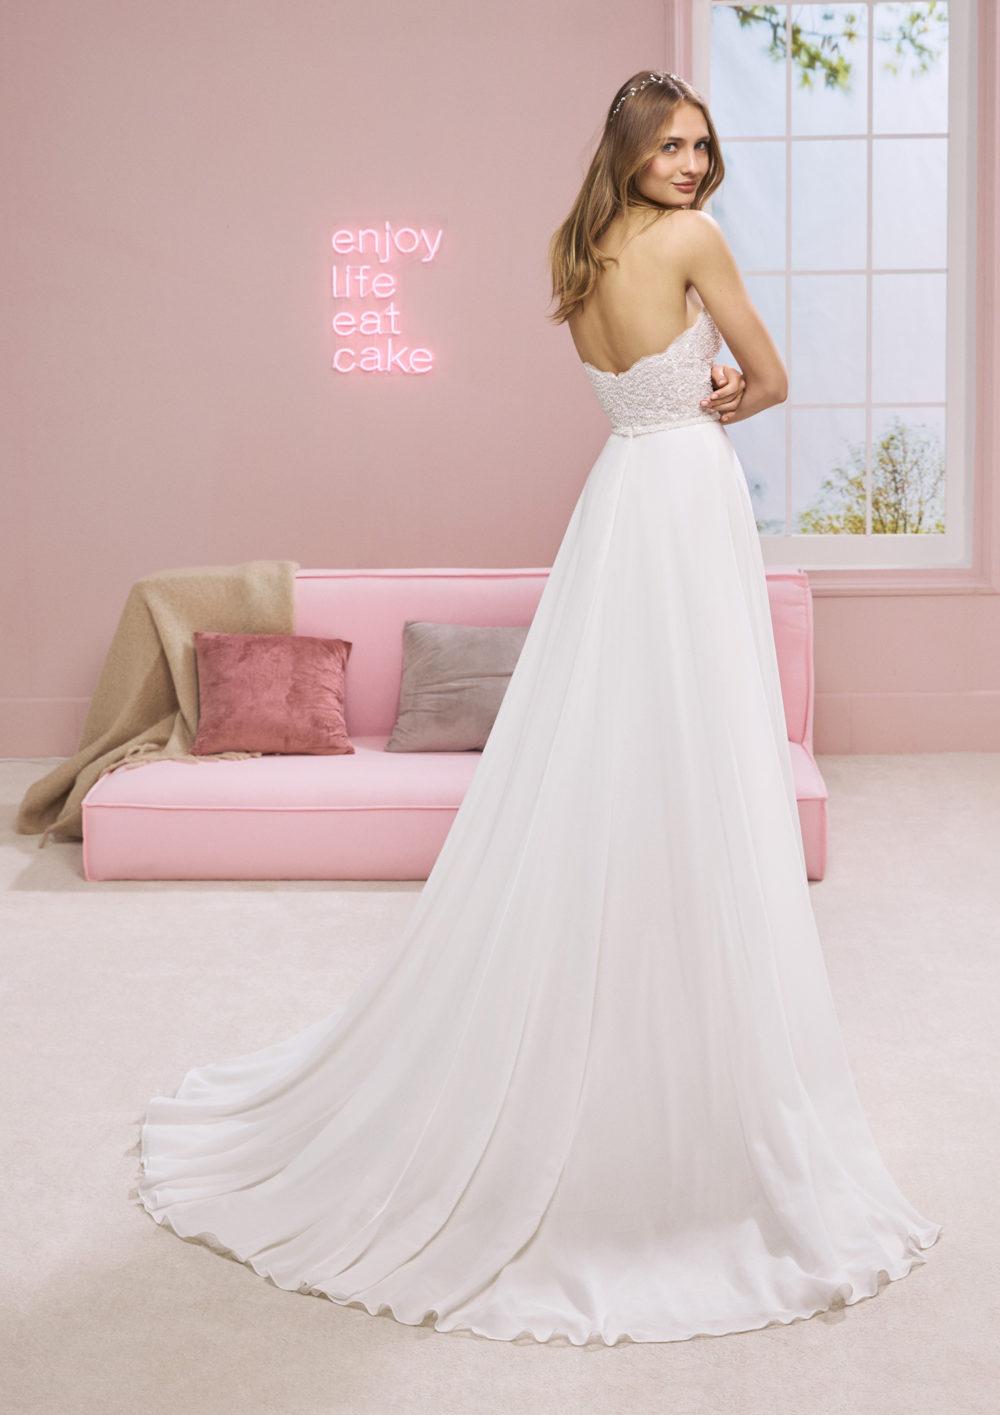 MMariages: abito da sposa Poème 2020 a Vicenza, Verona, Padova, Veneto HALSEY